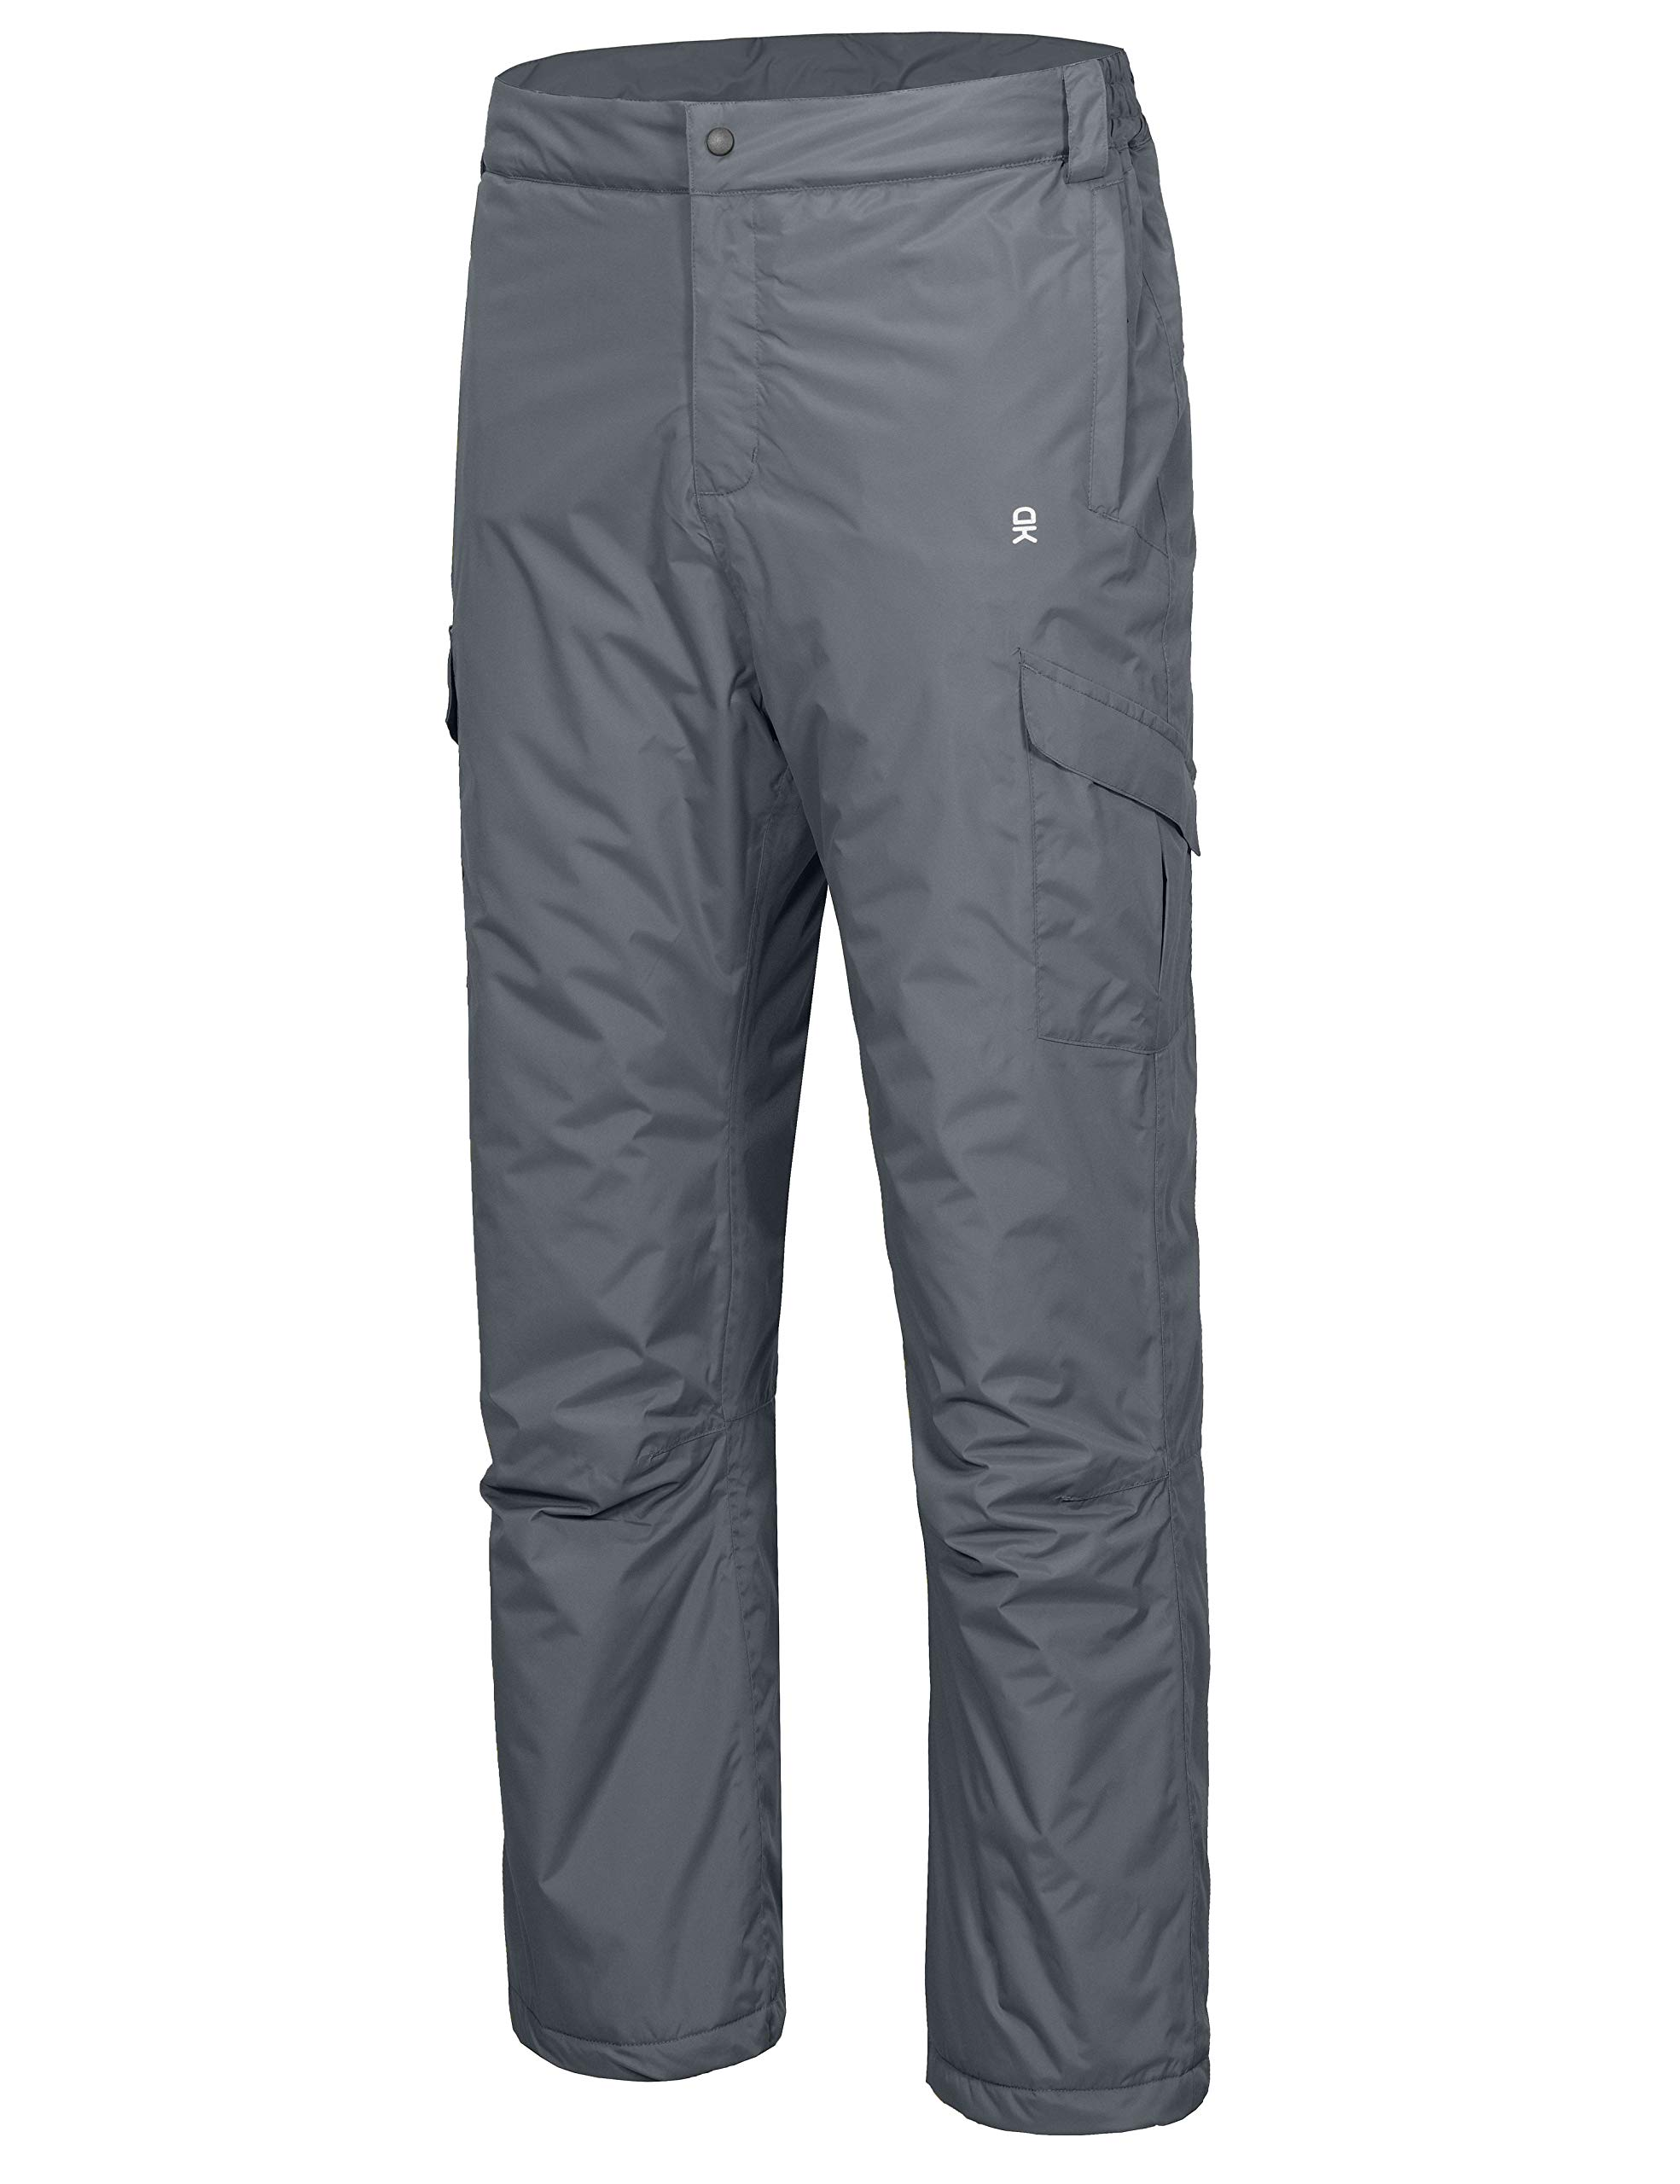 Little Donkey Andy Mens Waterproof Ski Snow Pants Warm Winter Snowboarding Outdoor Pants Black L